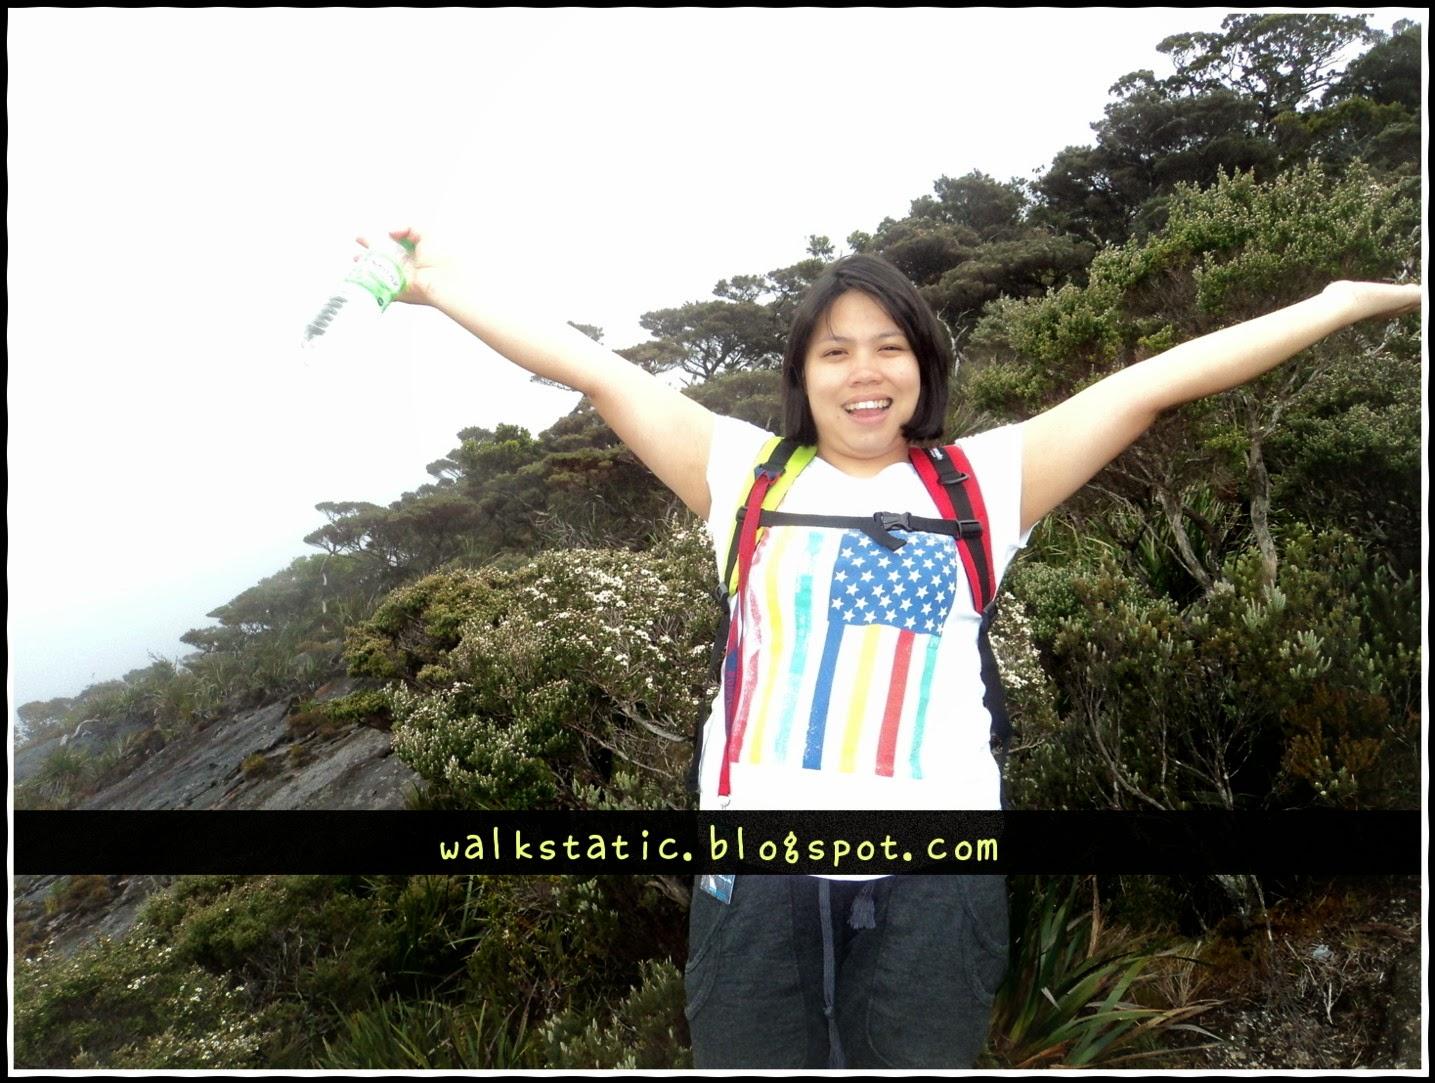 Ekpedisi Mendaki Gunung Kinabalu 2015